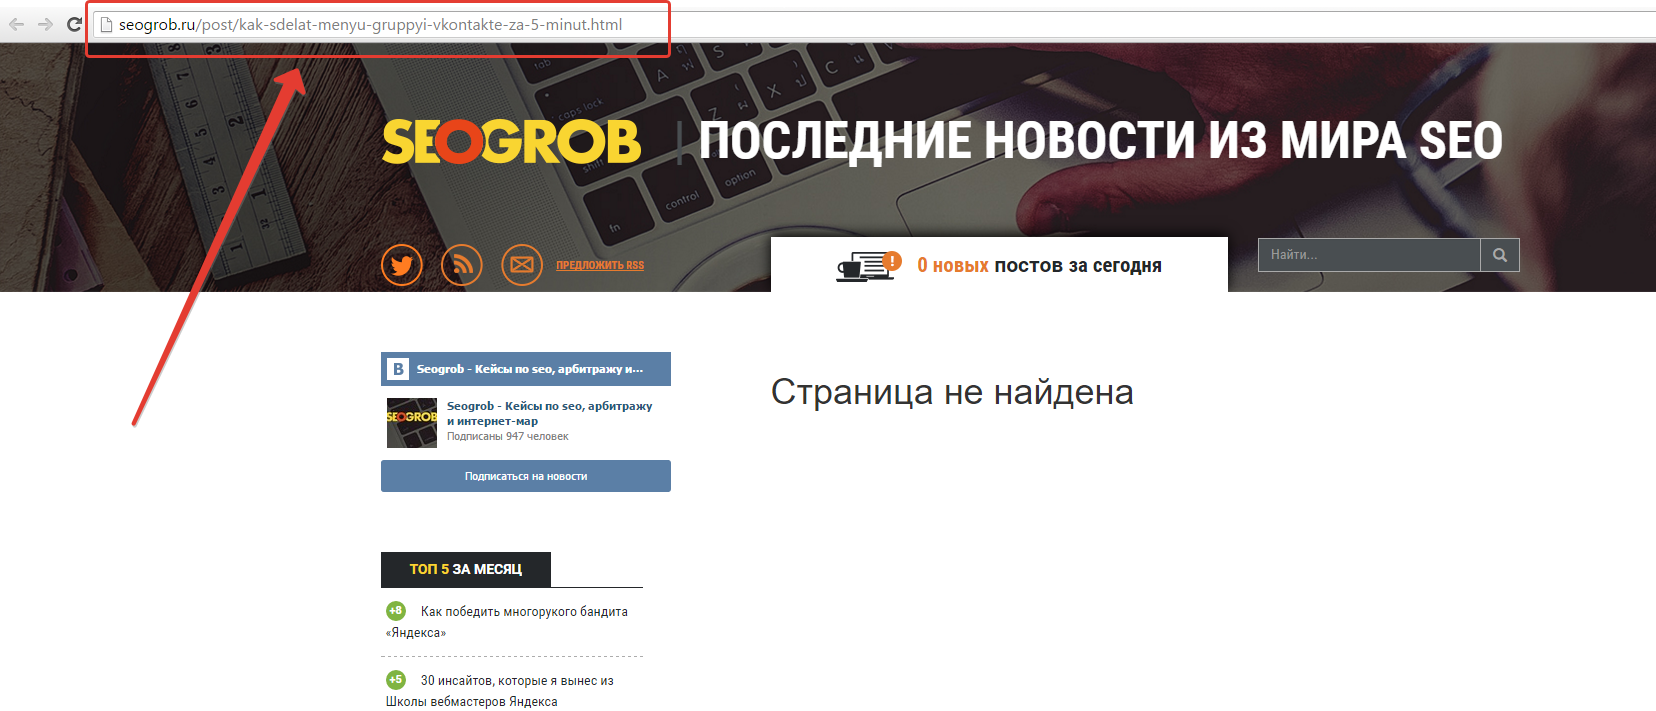 Блог Арбайтена (отзыв). Я Арбайтен и Сеошник всея Руси, идите нах…